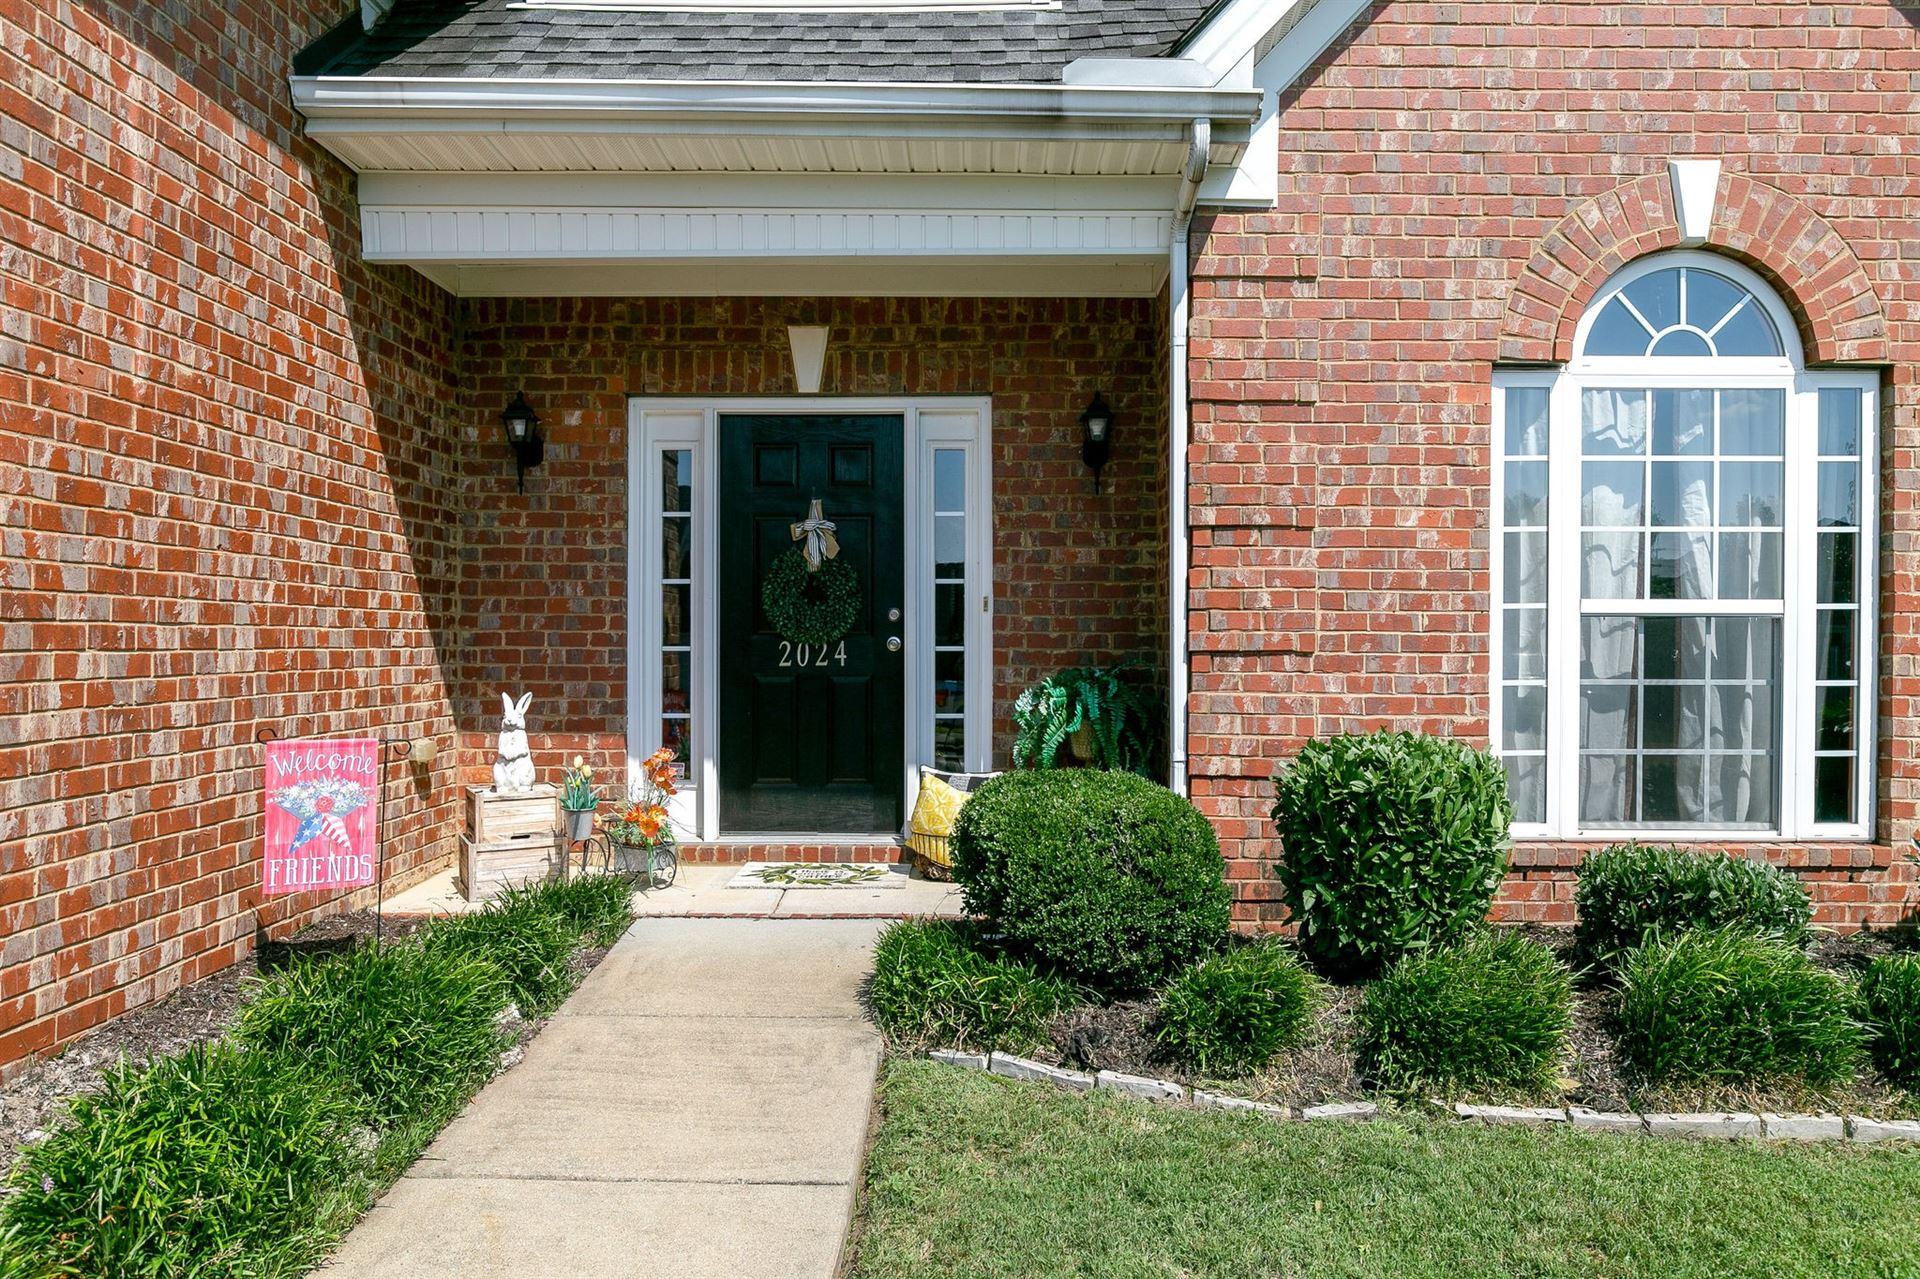 Photo of 2024 Fiona Way, Spring Hill, TN 37174 (MLS # 2294215)